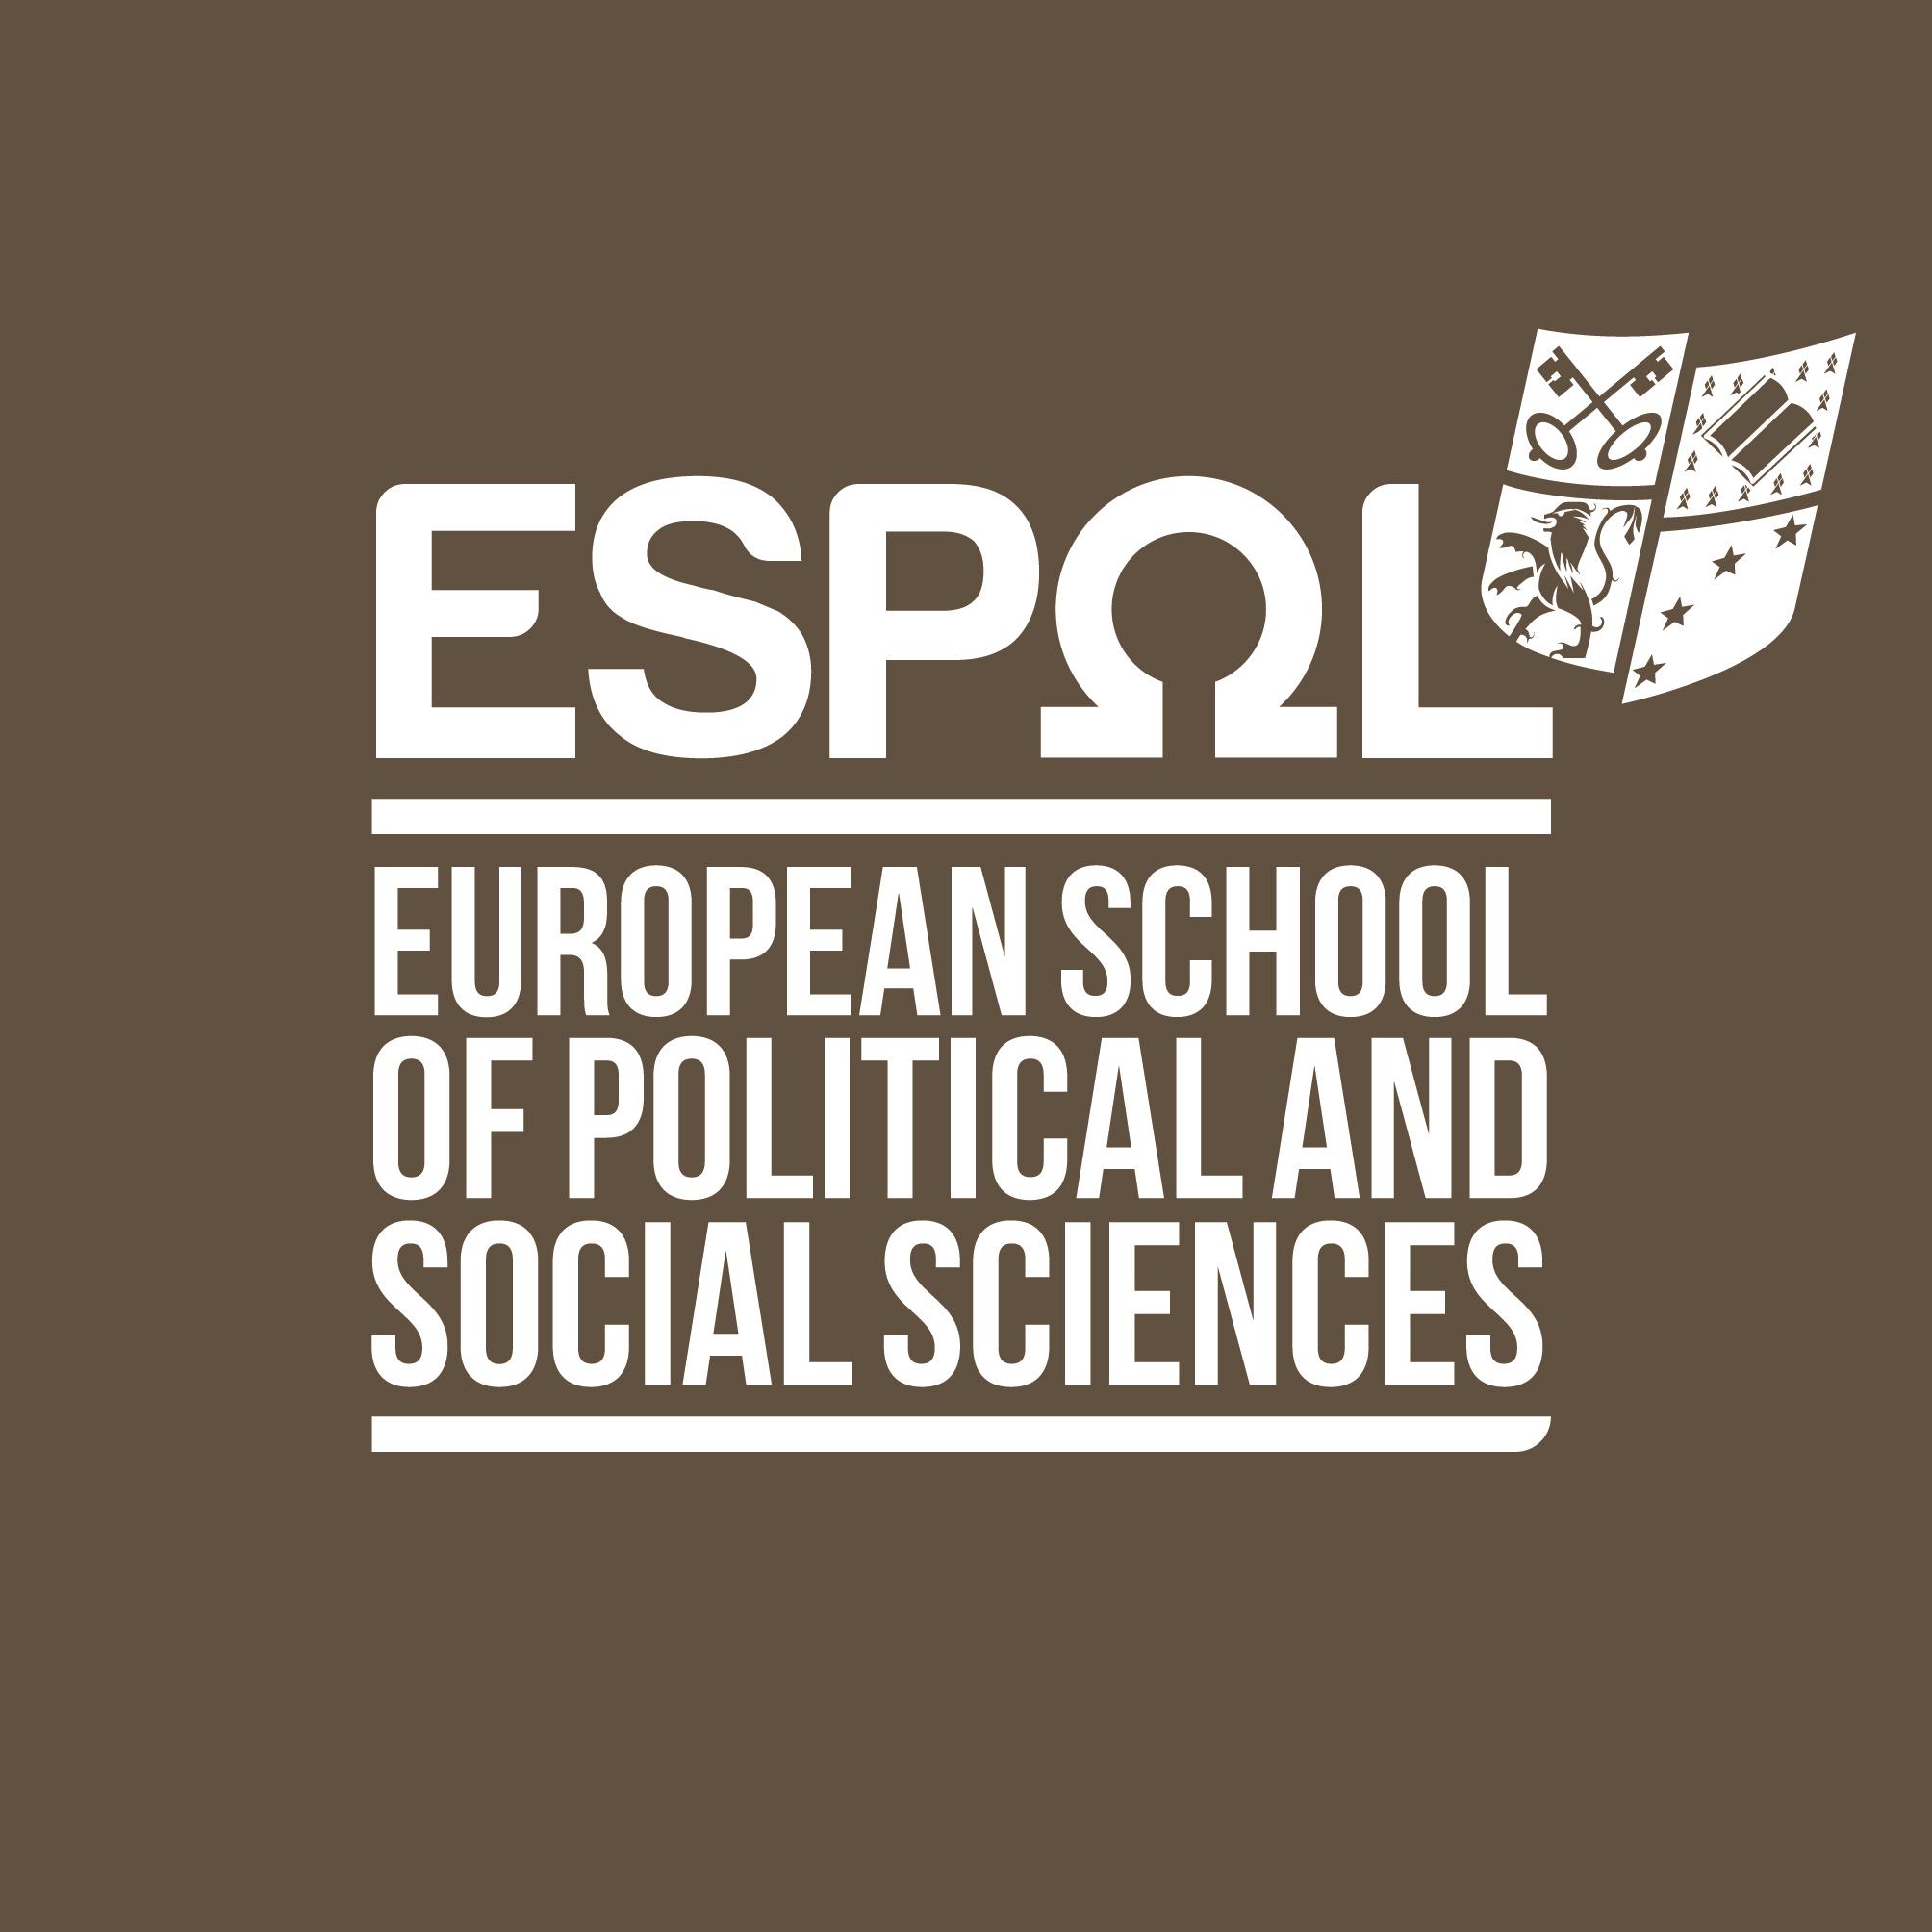 European School of Political and Social Sciences - Espol